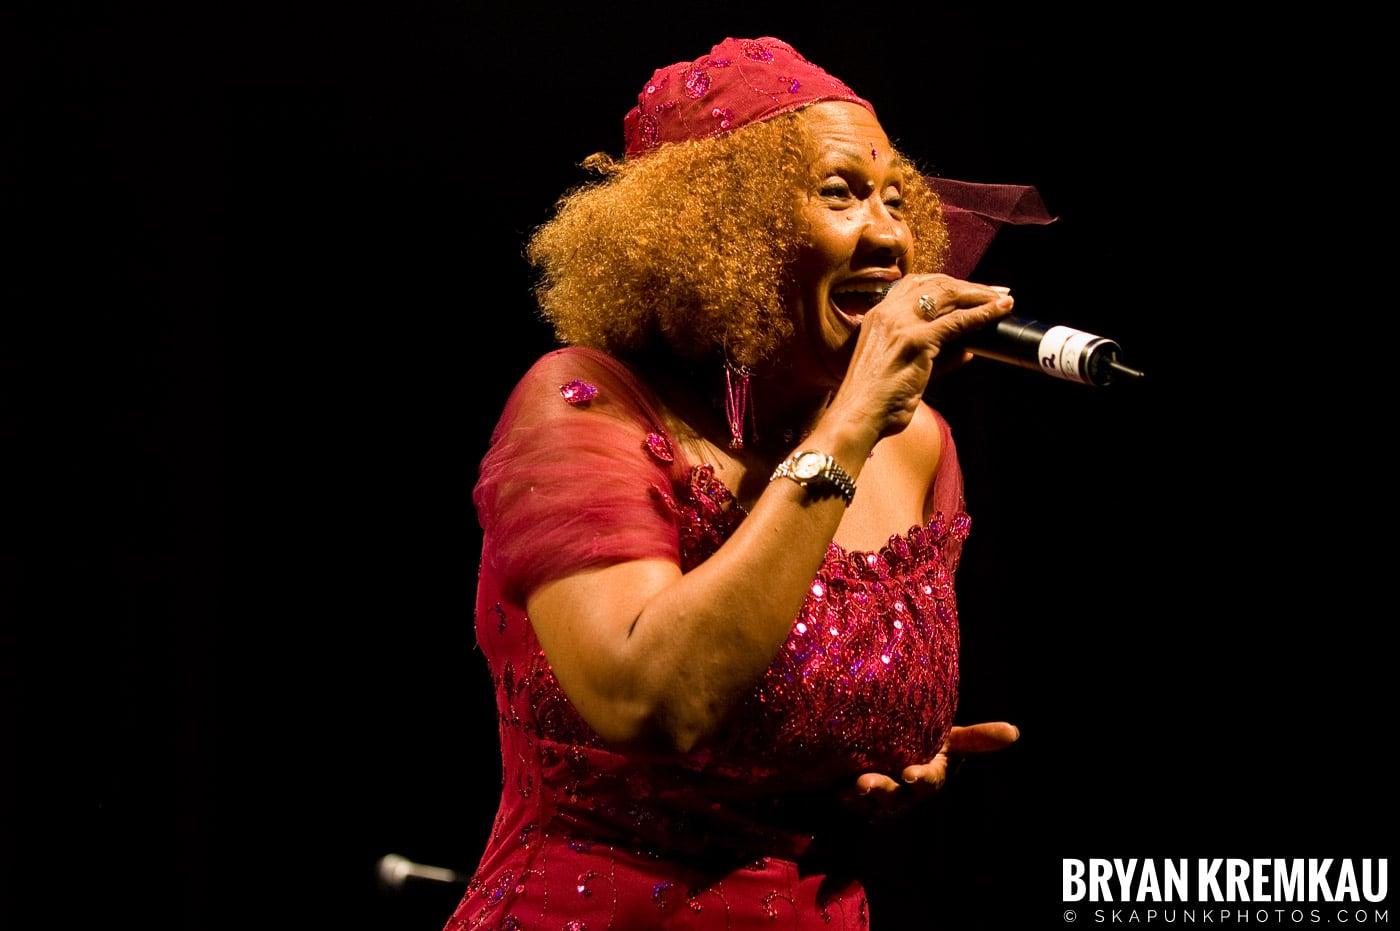 Marcia Griffiths @ Vintage Reggae Fest - Hammerstein Ballroom, NYC - 12.16.2007 (7)